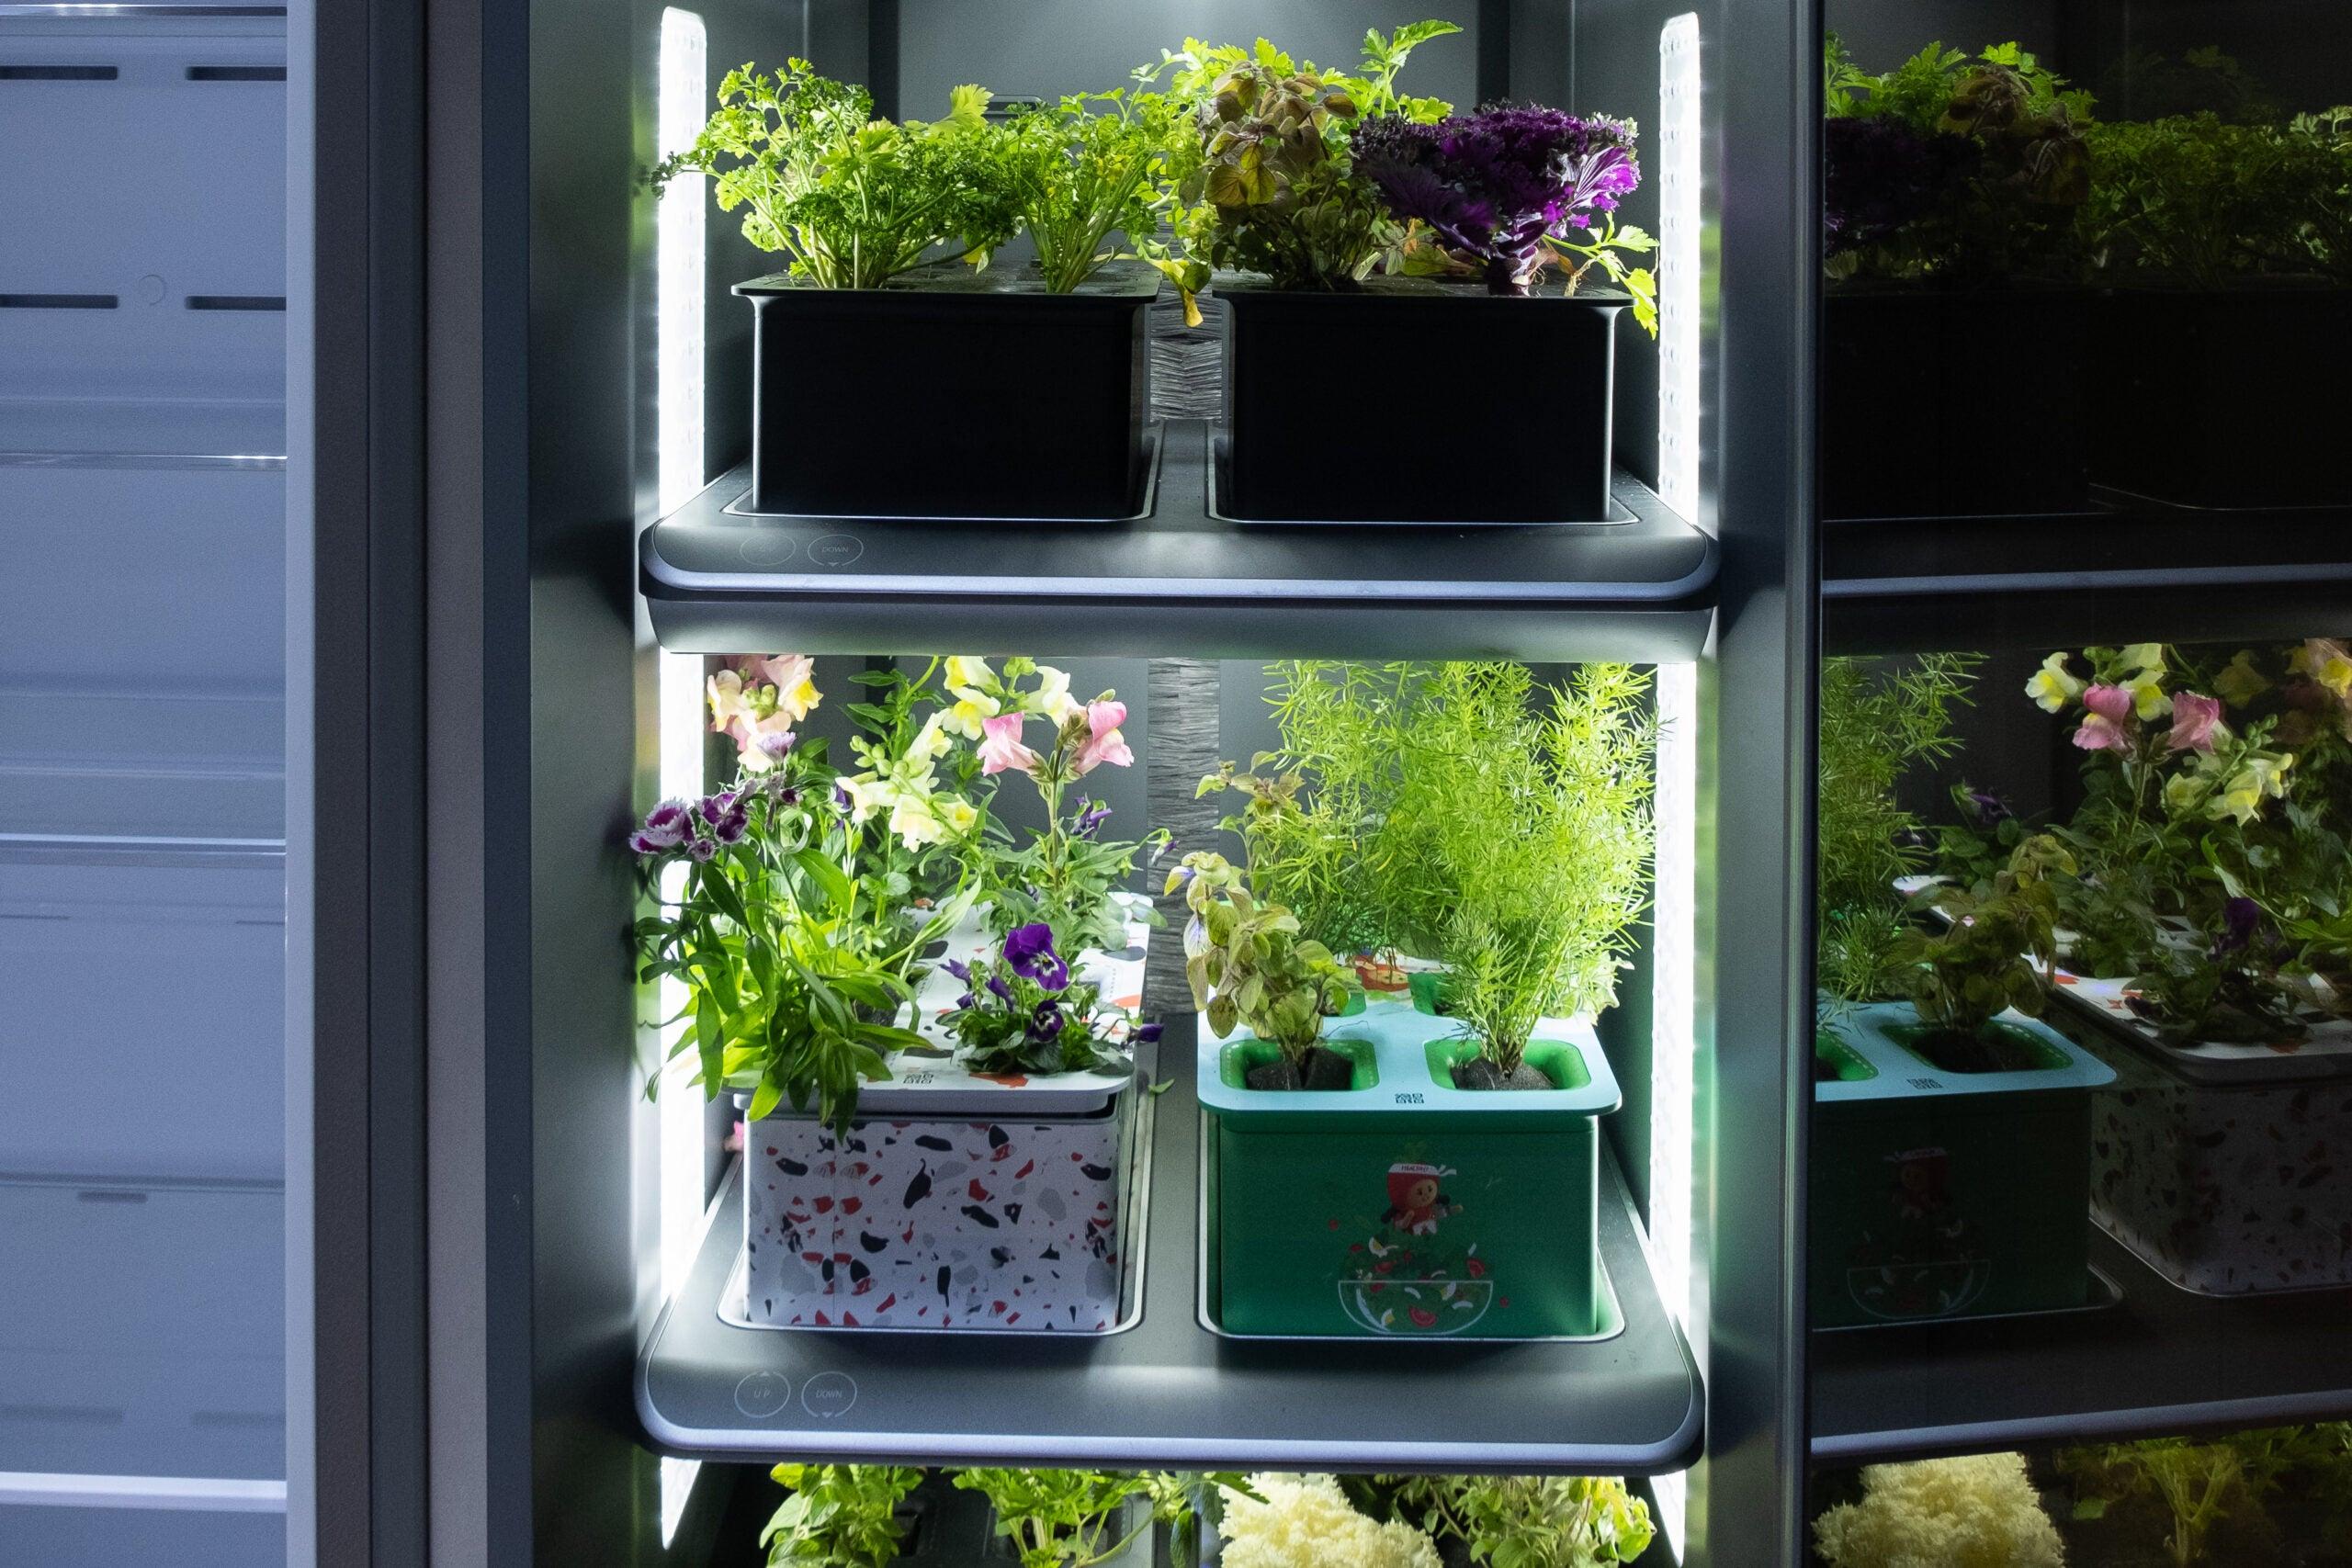 Samsung Bespoke Plant fridge.